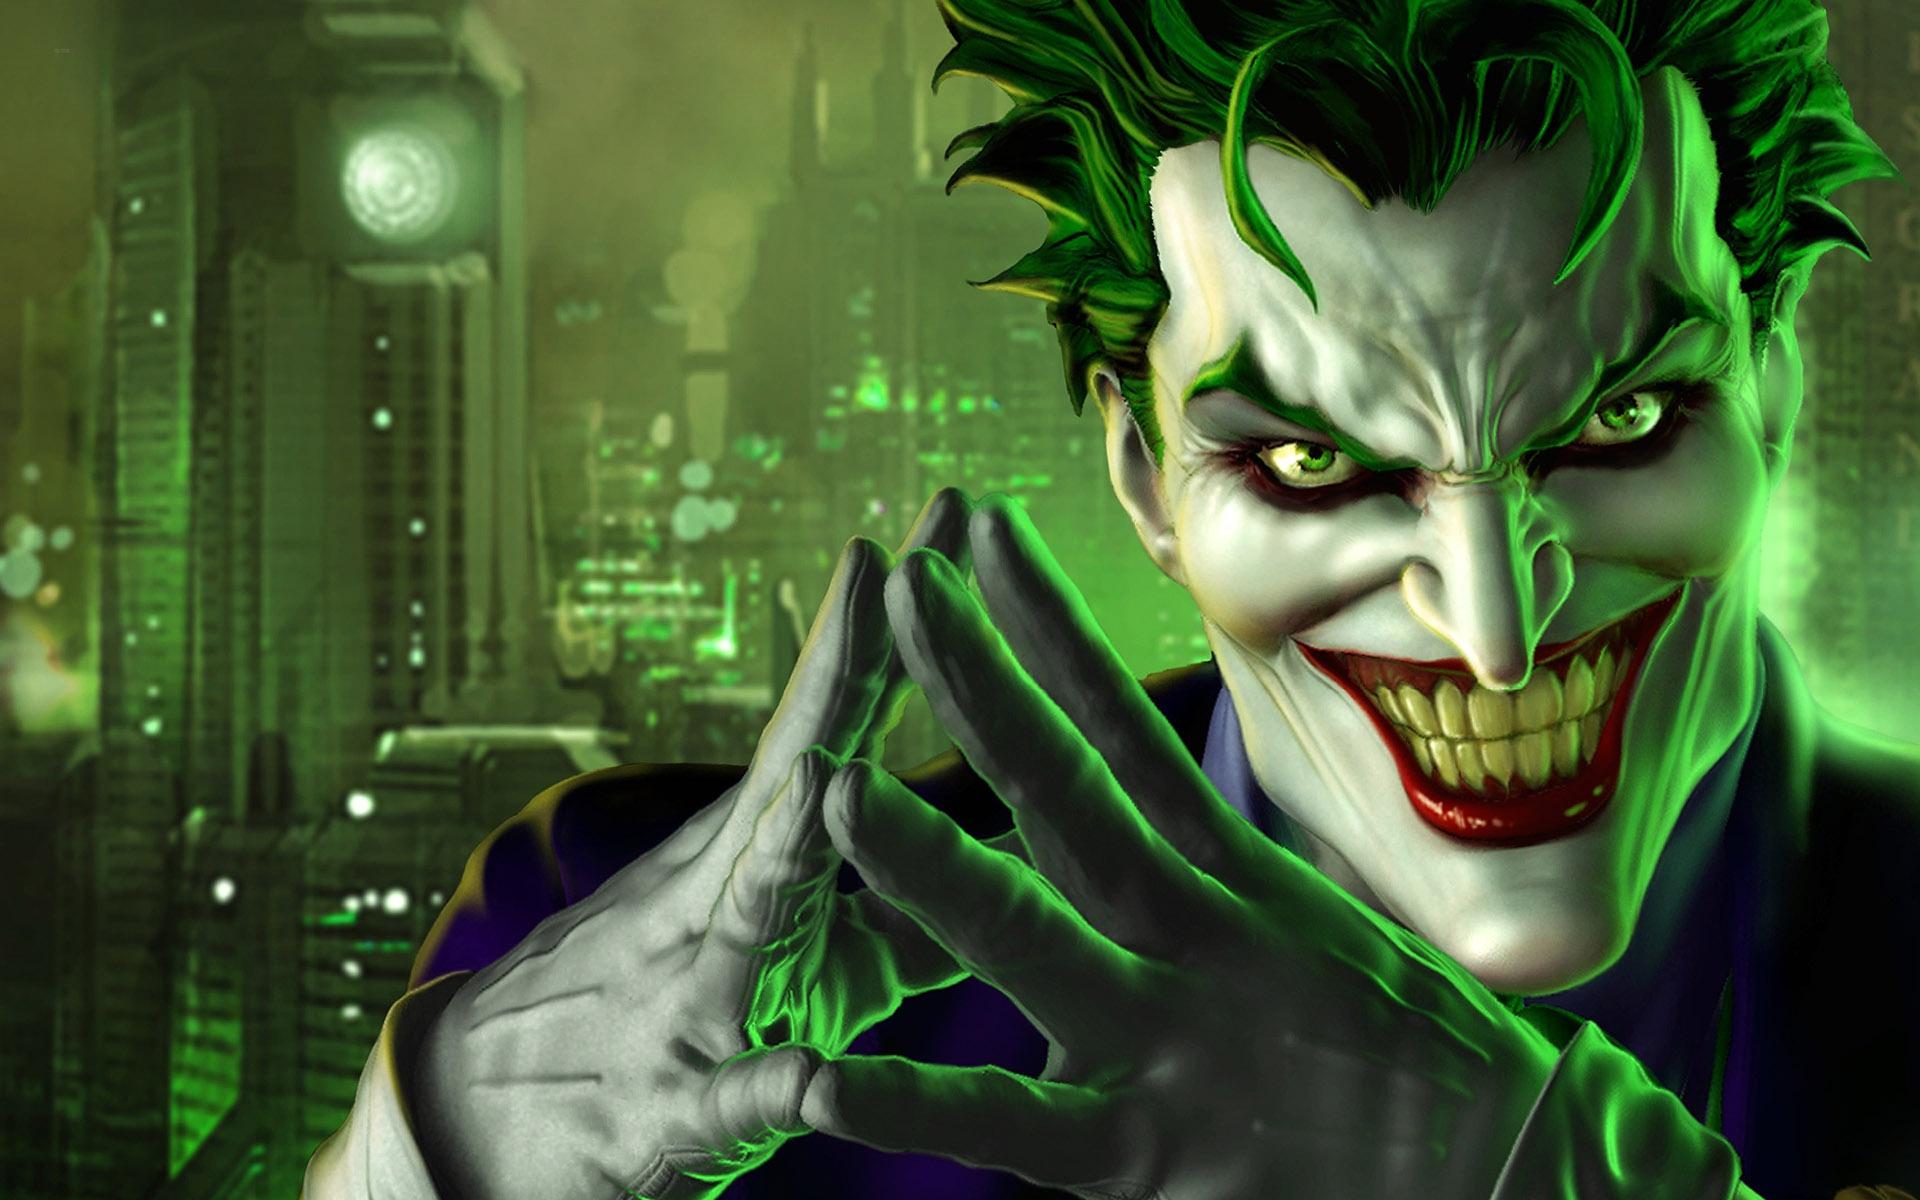 Batman Joker Wallpapers - Full HD wallpaper search | Art